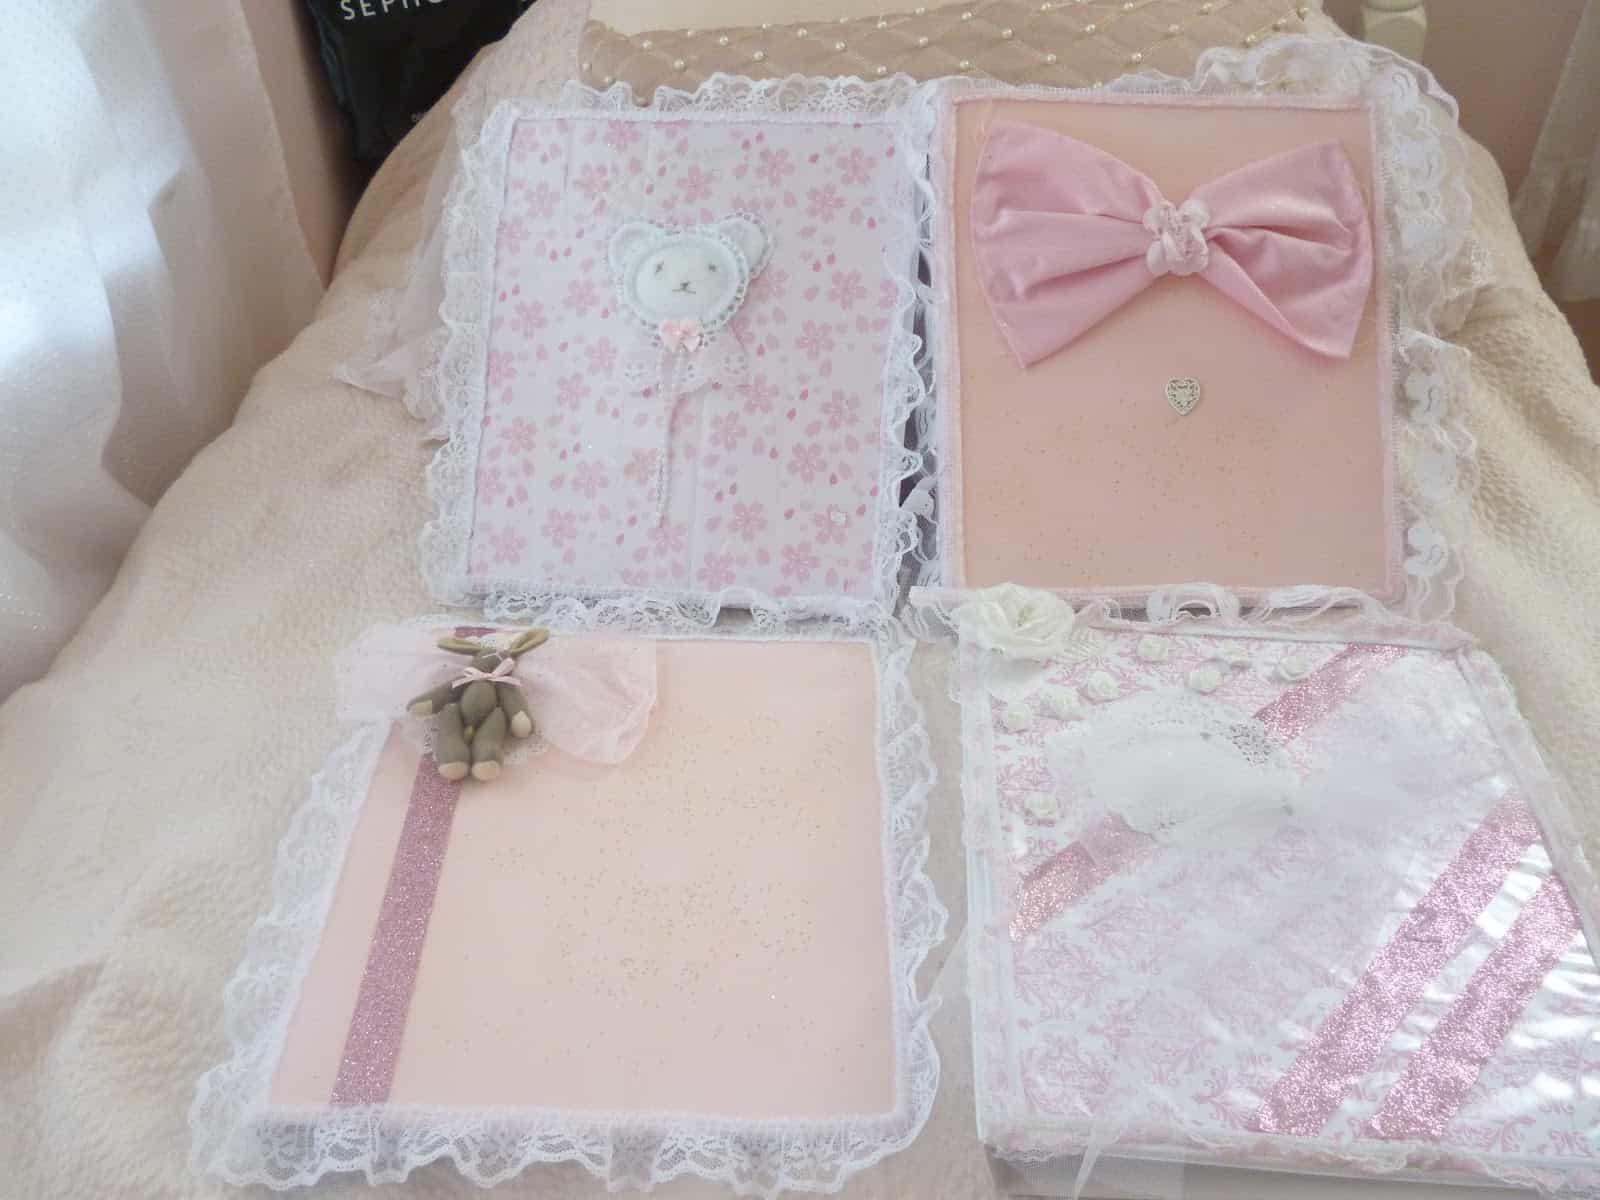 Lacy kawaii school notebooks